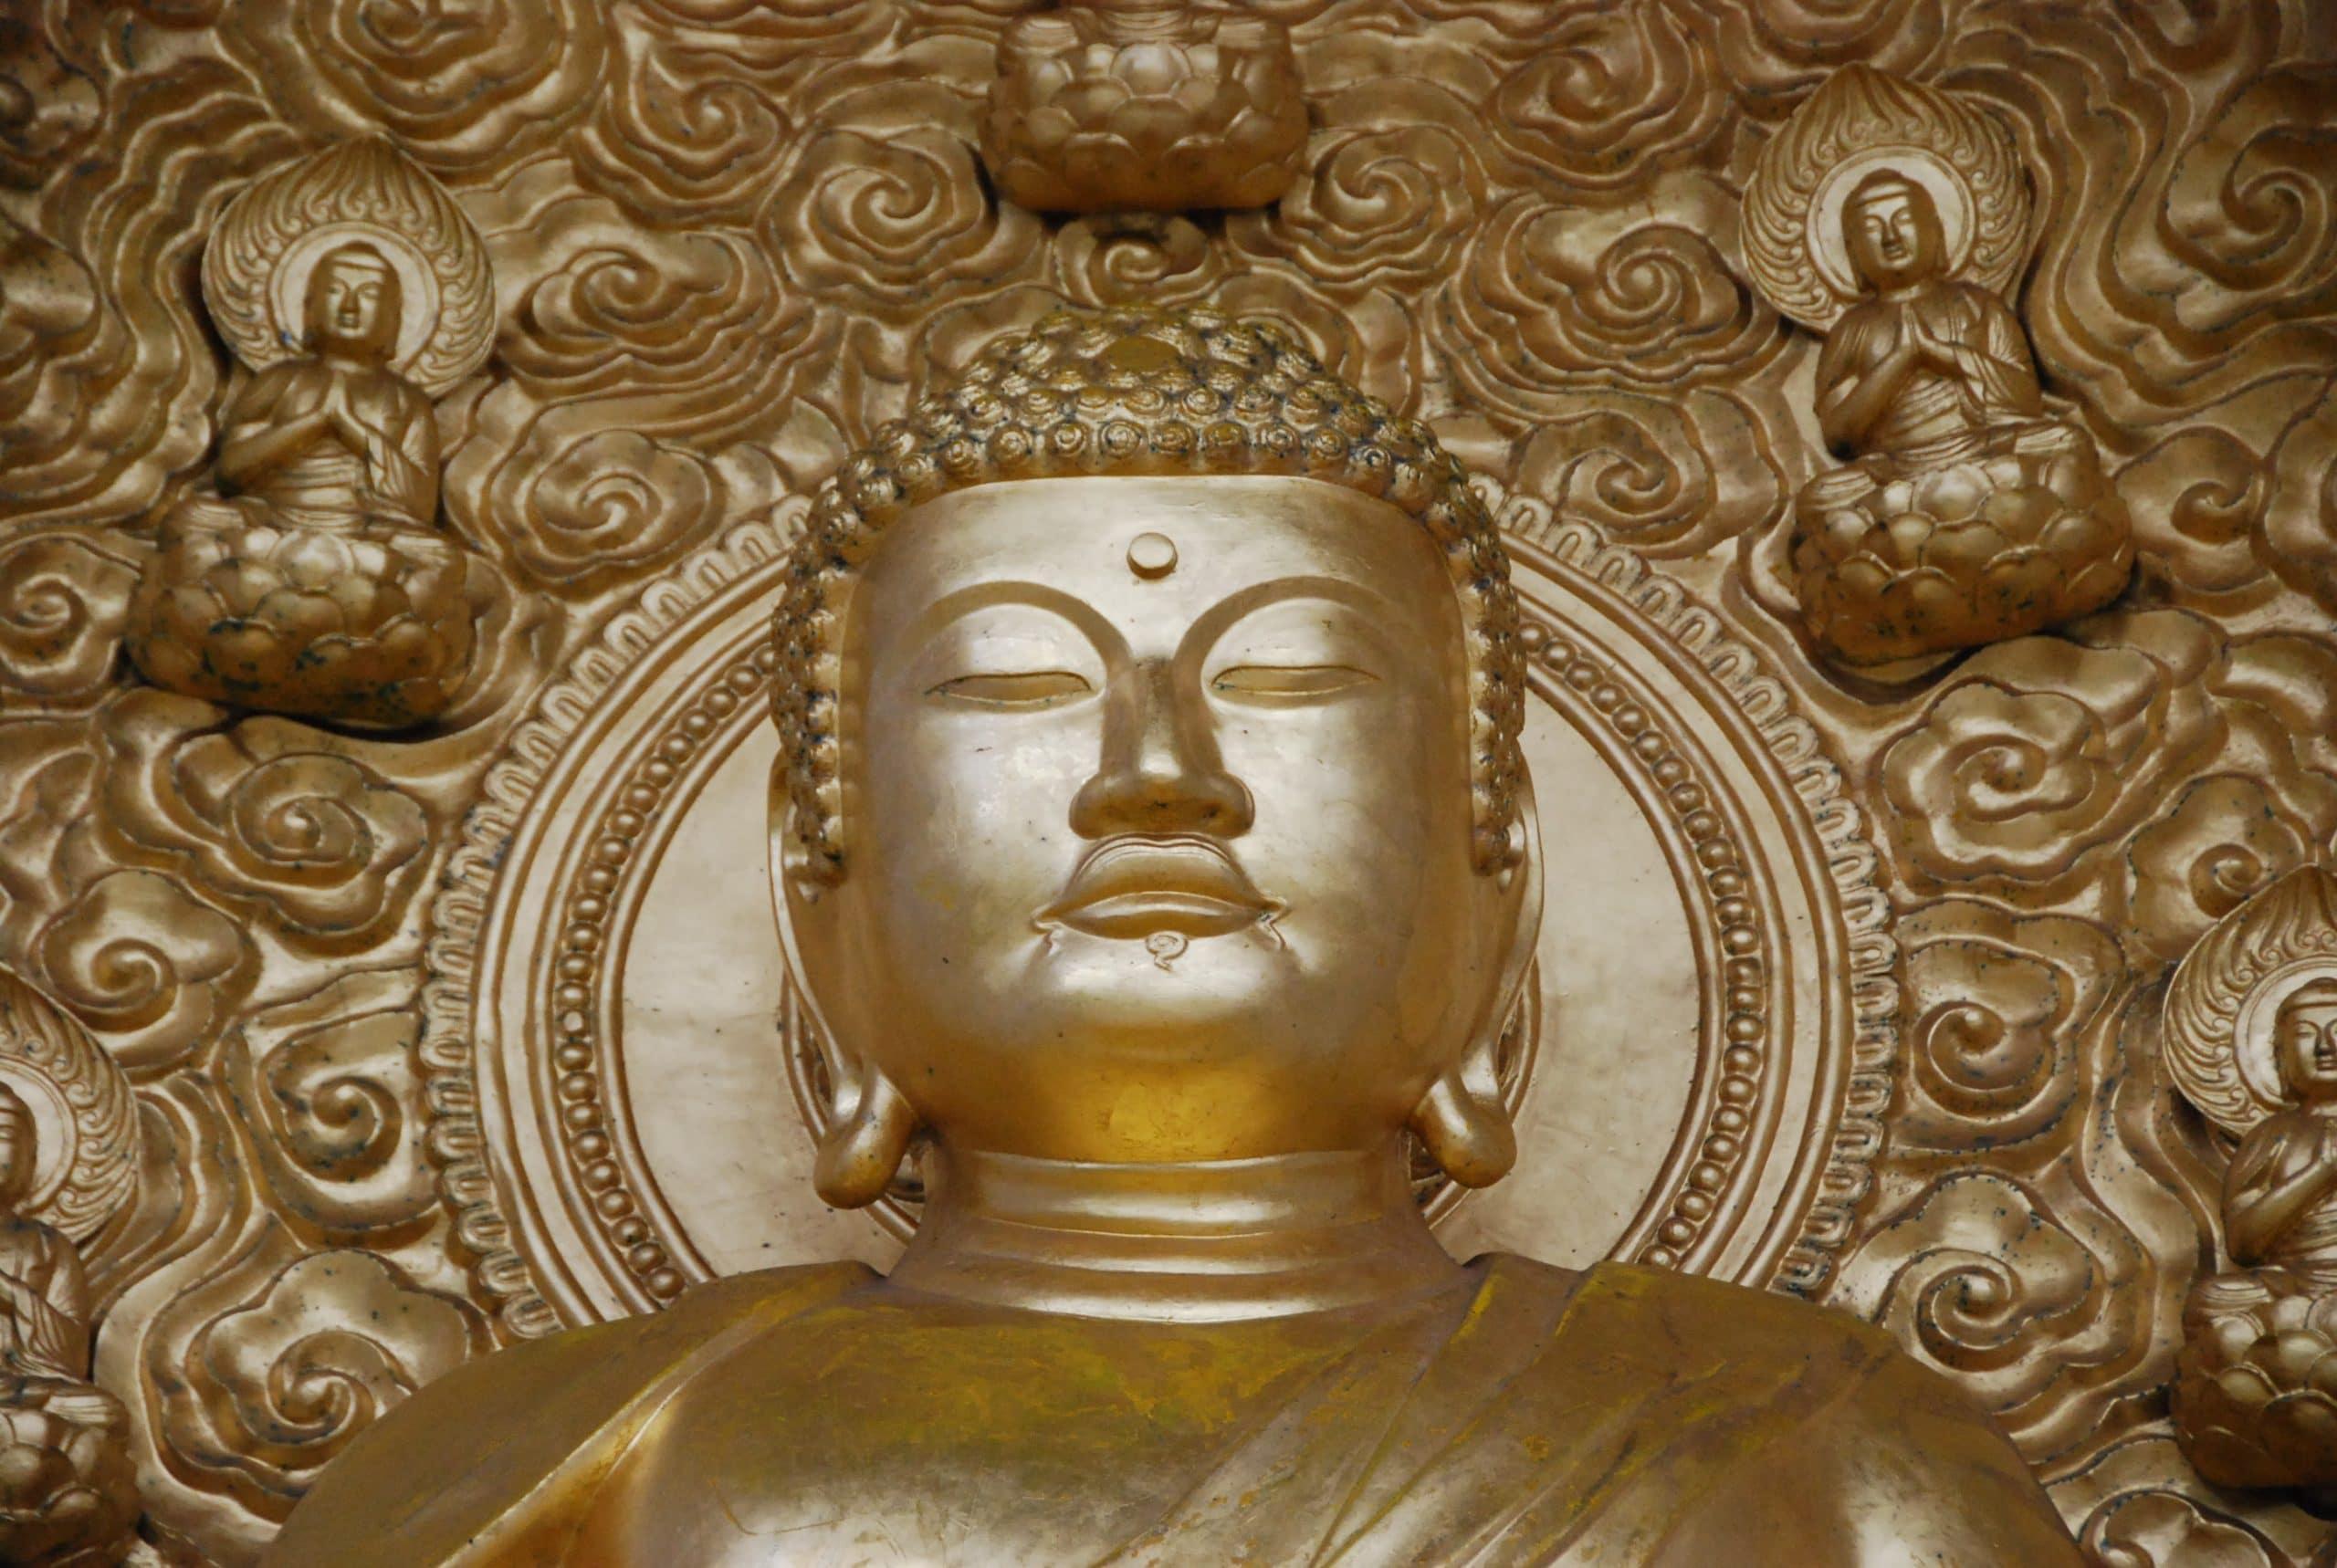 Escultura de Buda.